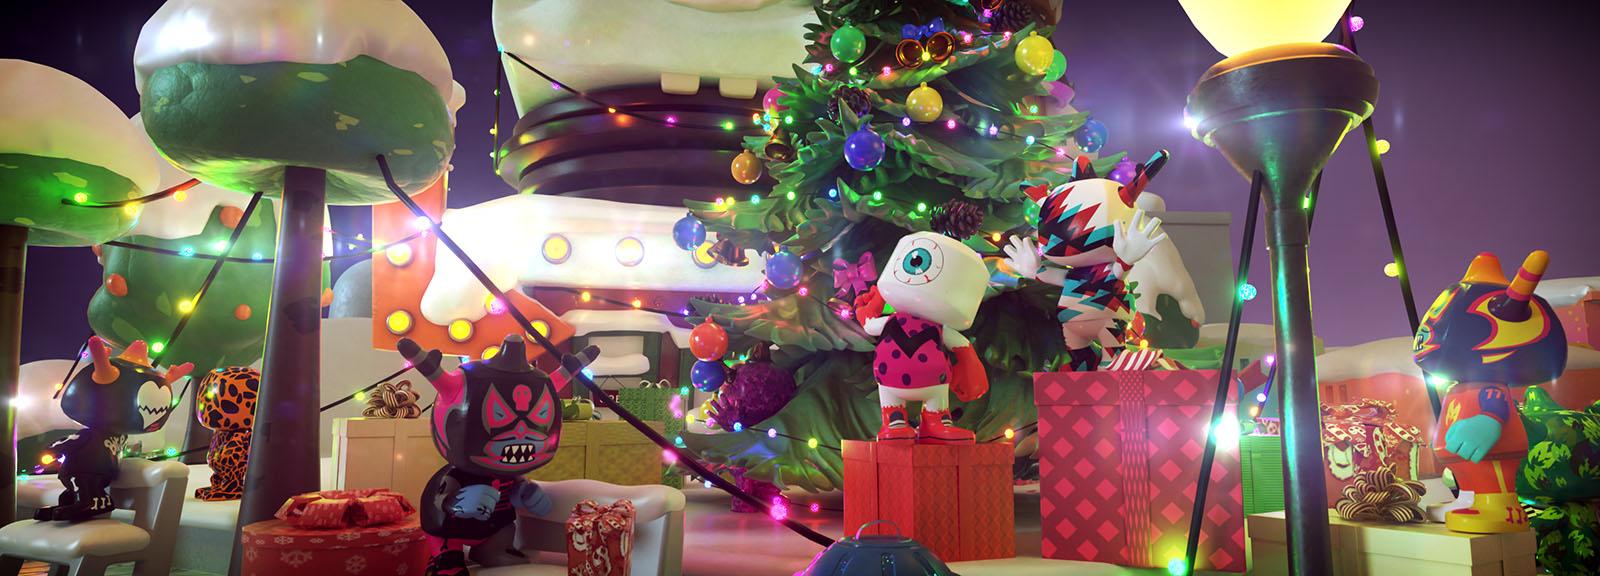 Blancos_Christmas_Trailer_TerritoryStudio_005